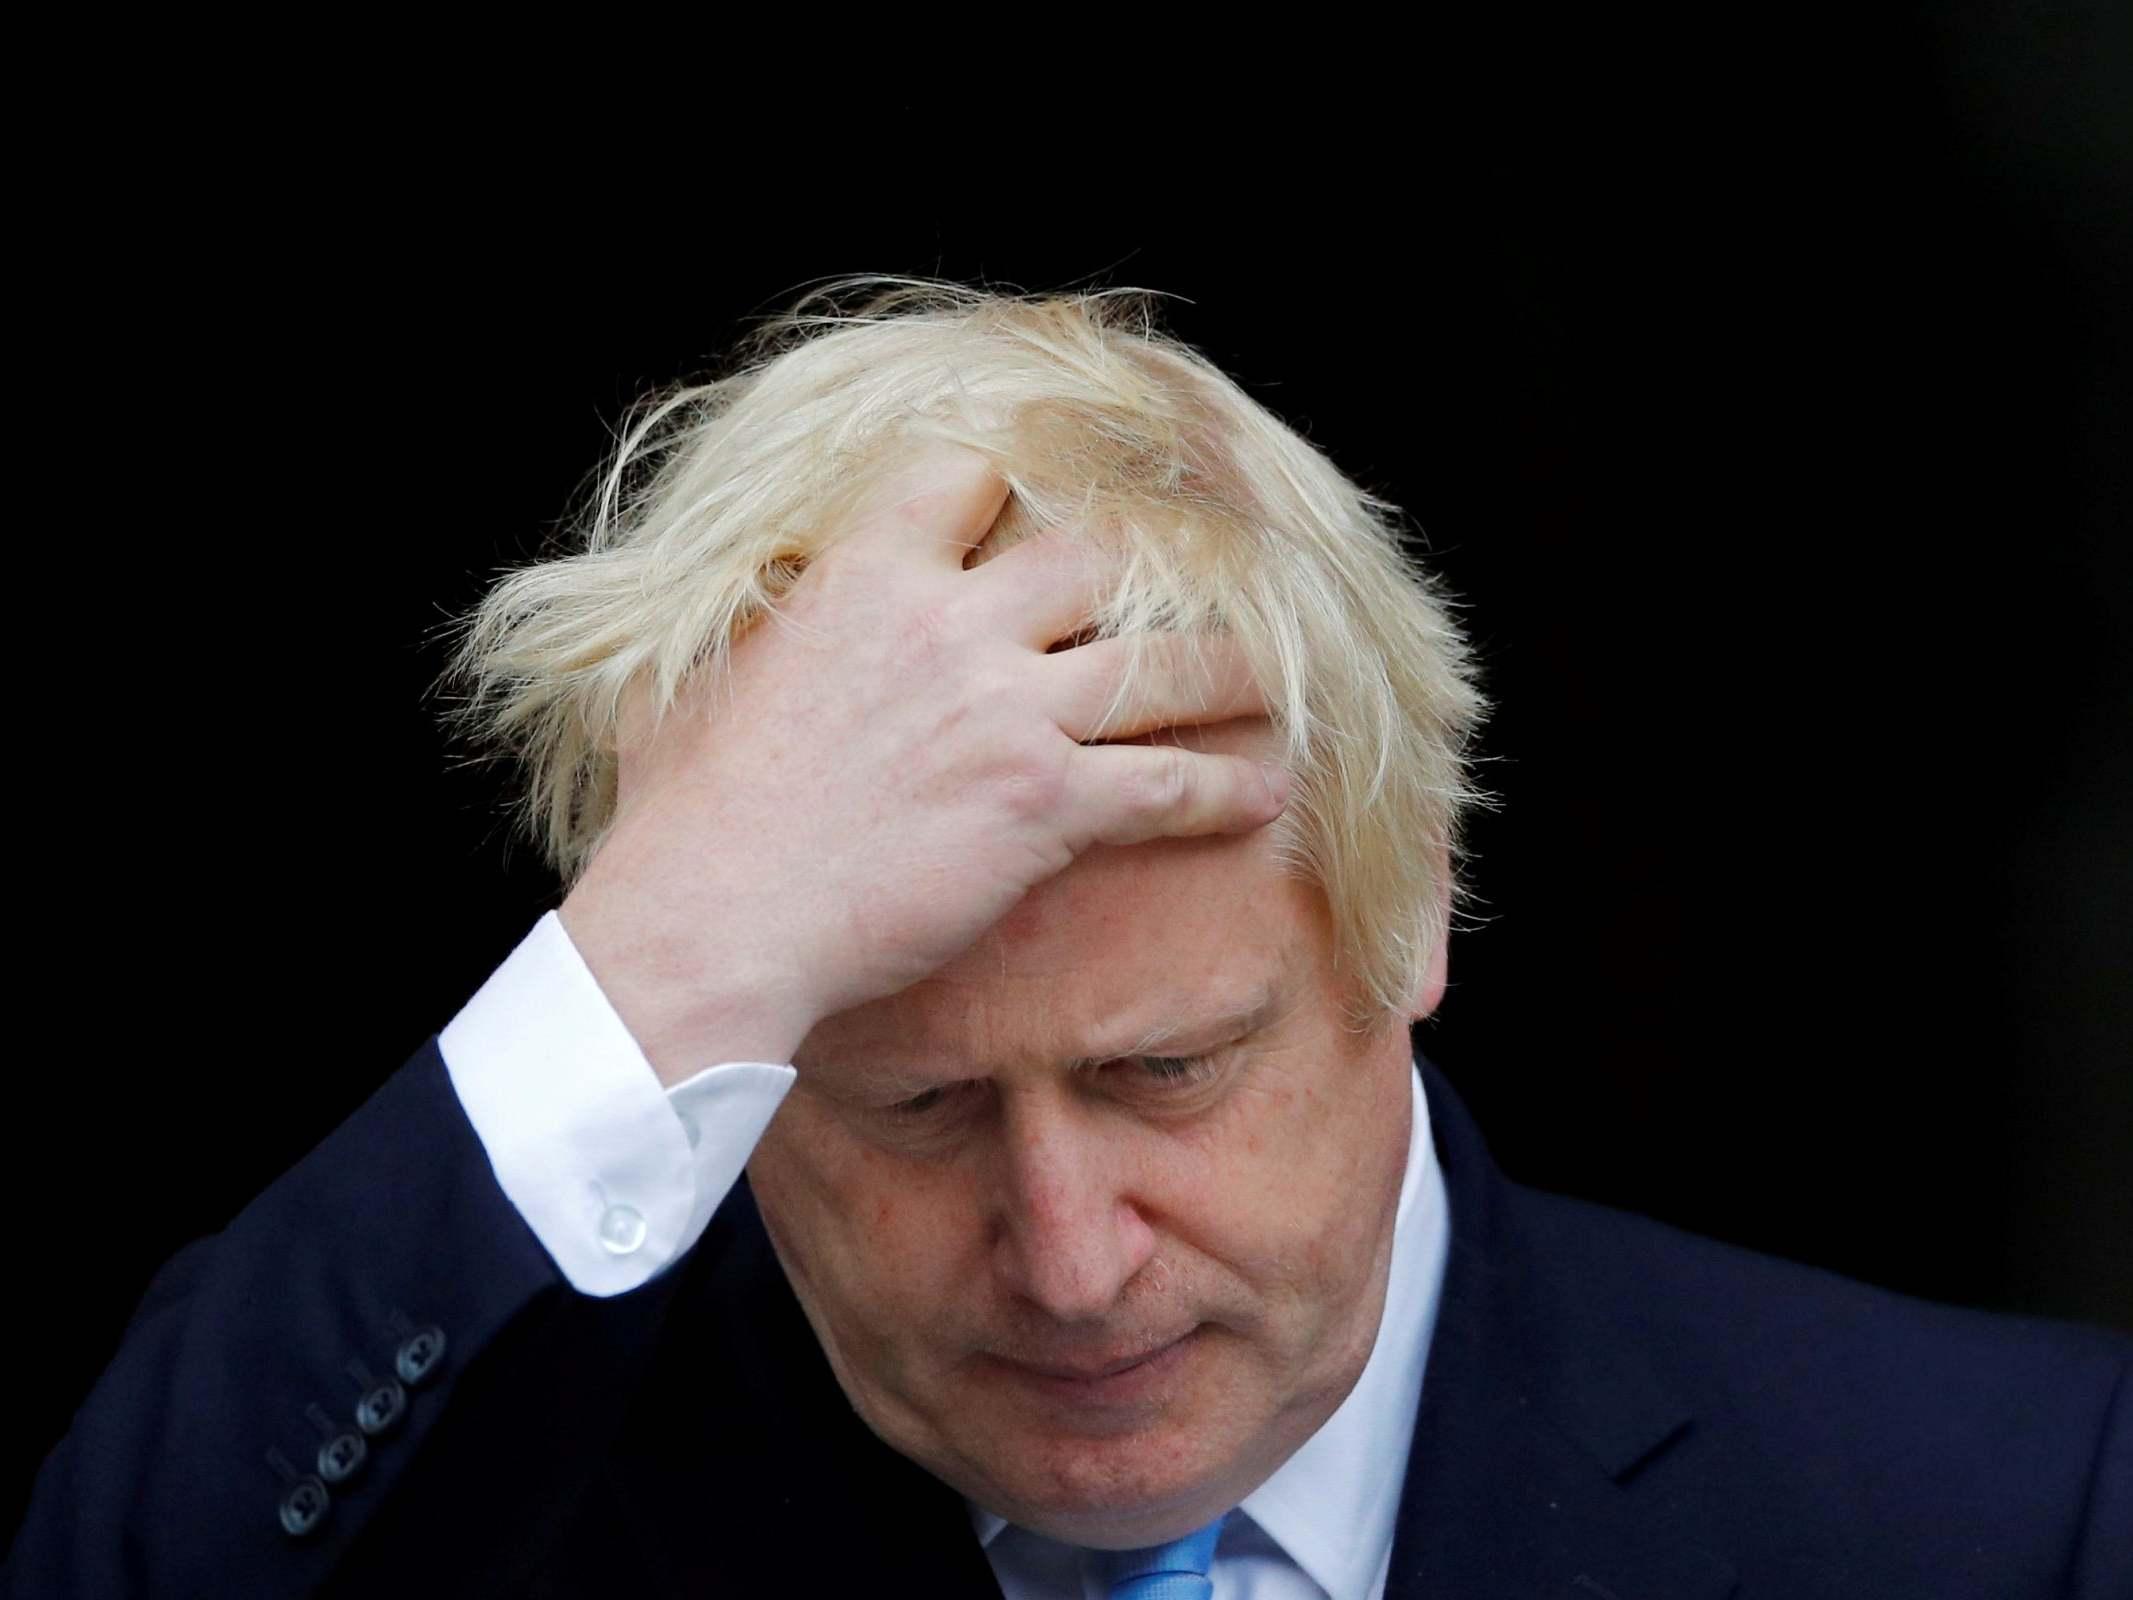 Boris Johnson accused of misleading the Queen over motive for suspending parliament